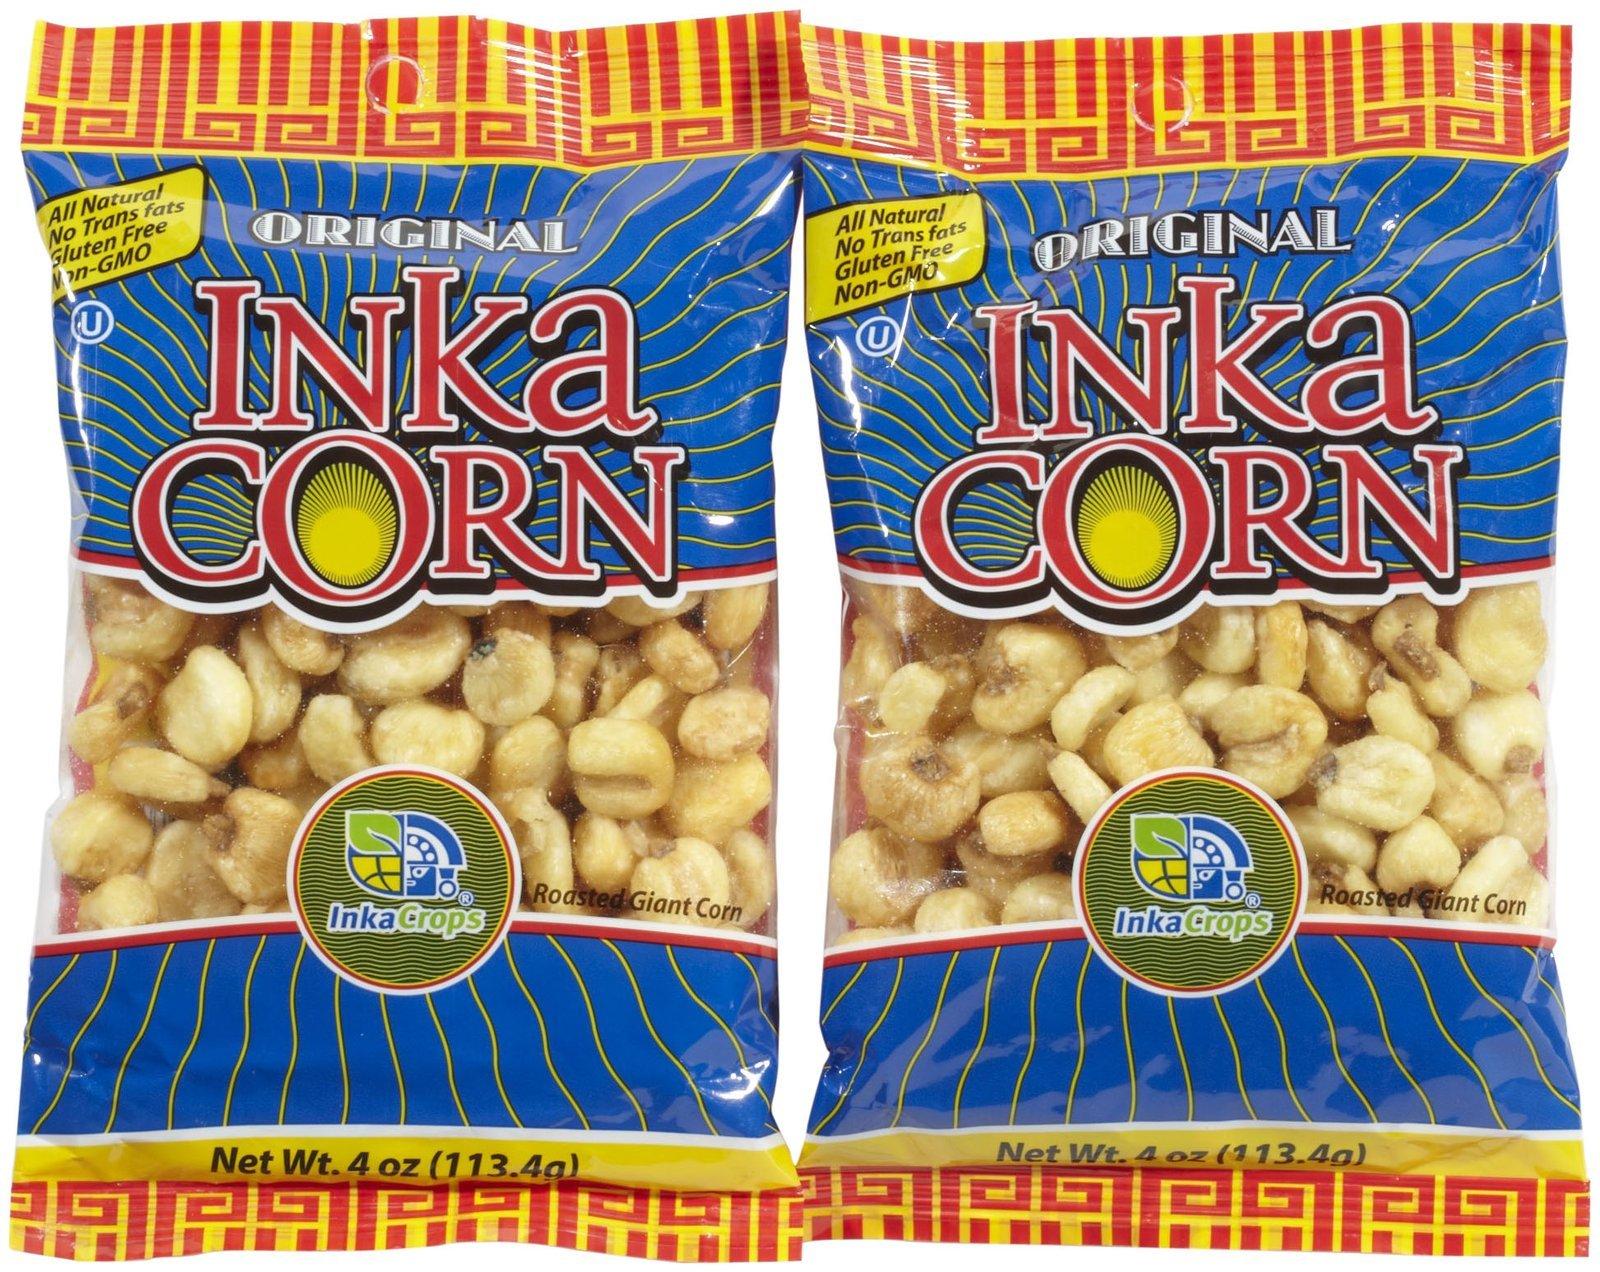 Inka Crops Original Inka Corn - 4 oz - 2 ct by Inka Crops (Image #1)